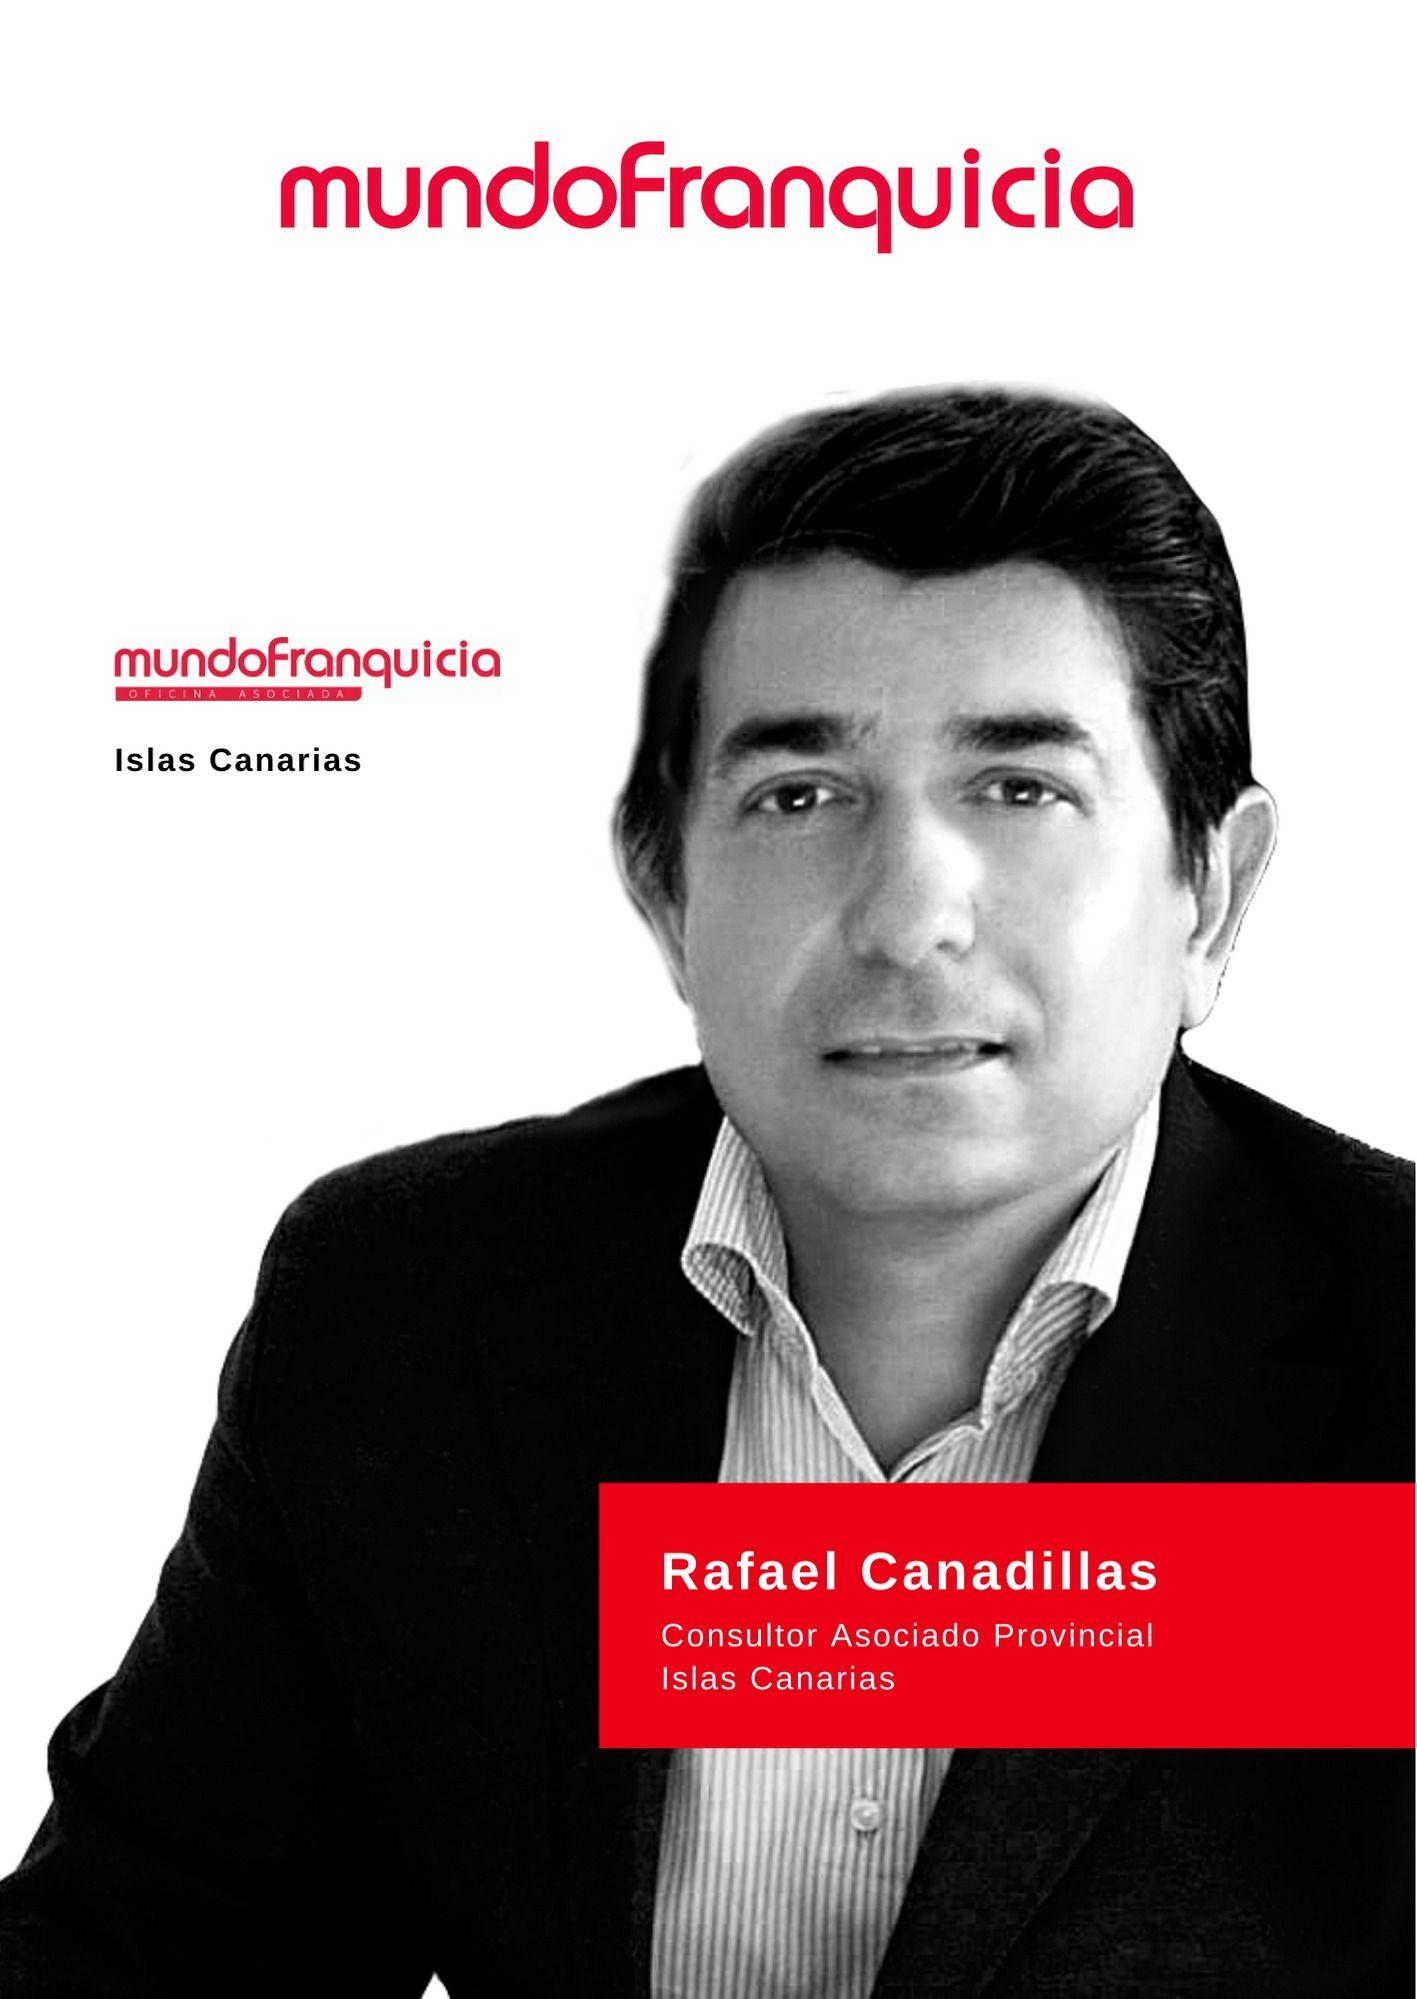 Rafael Cañadillas